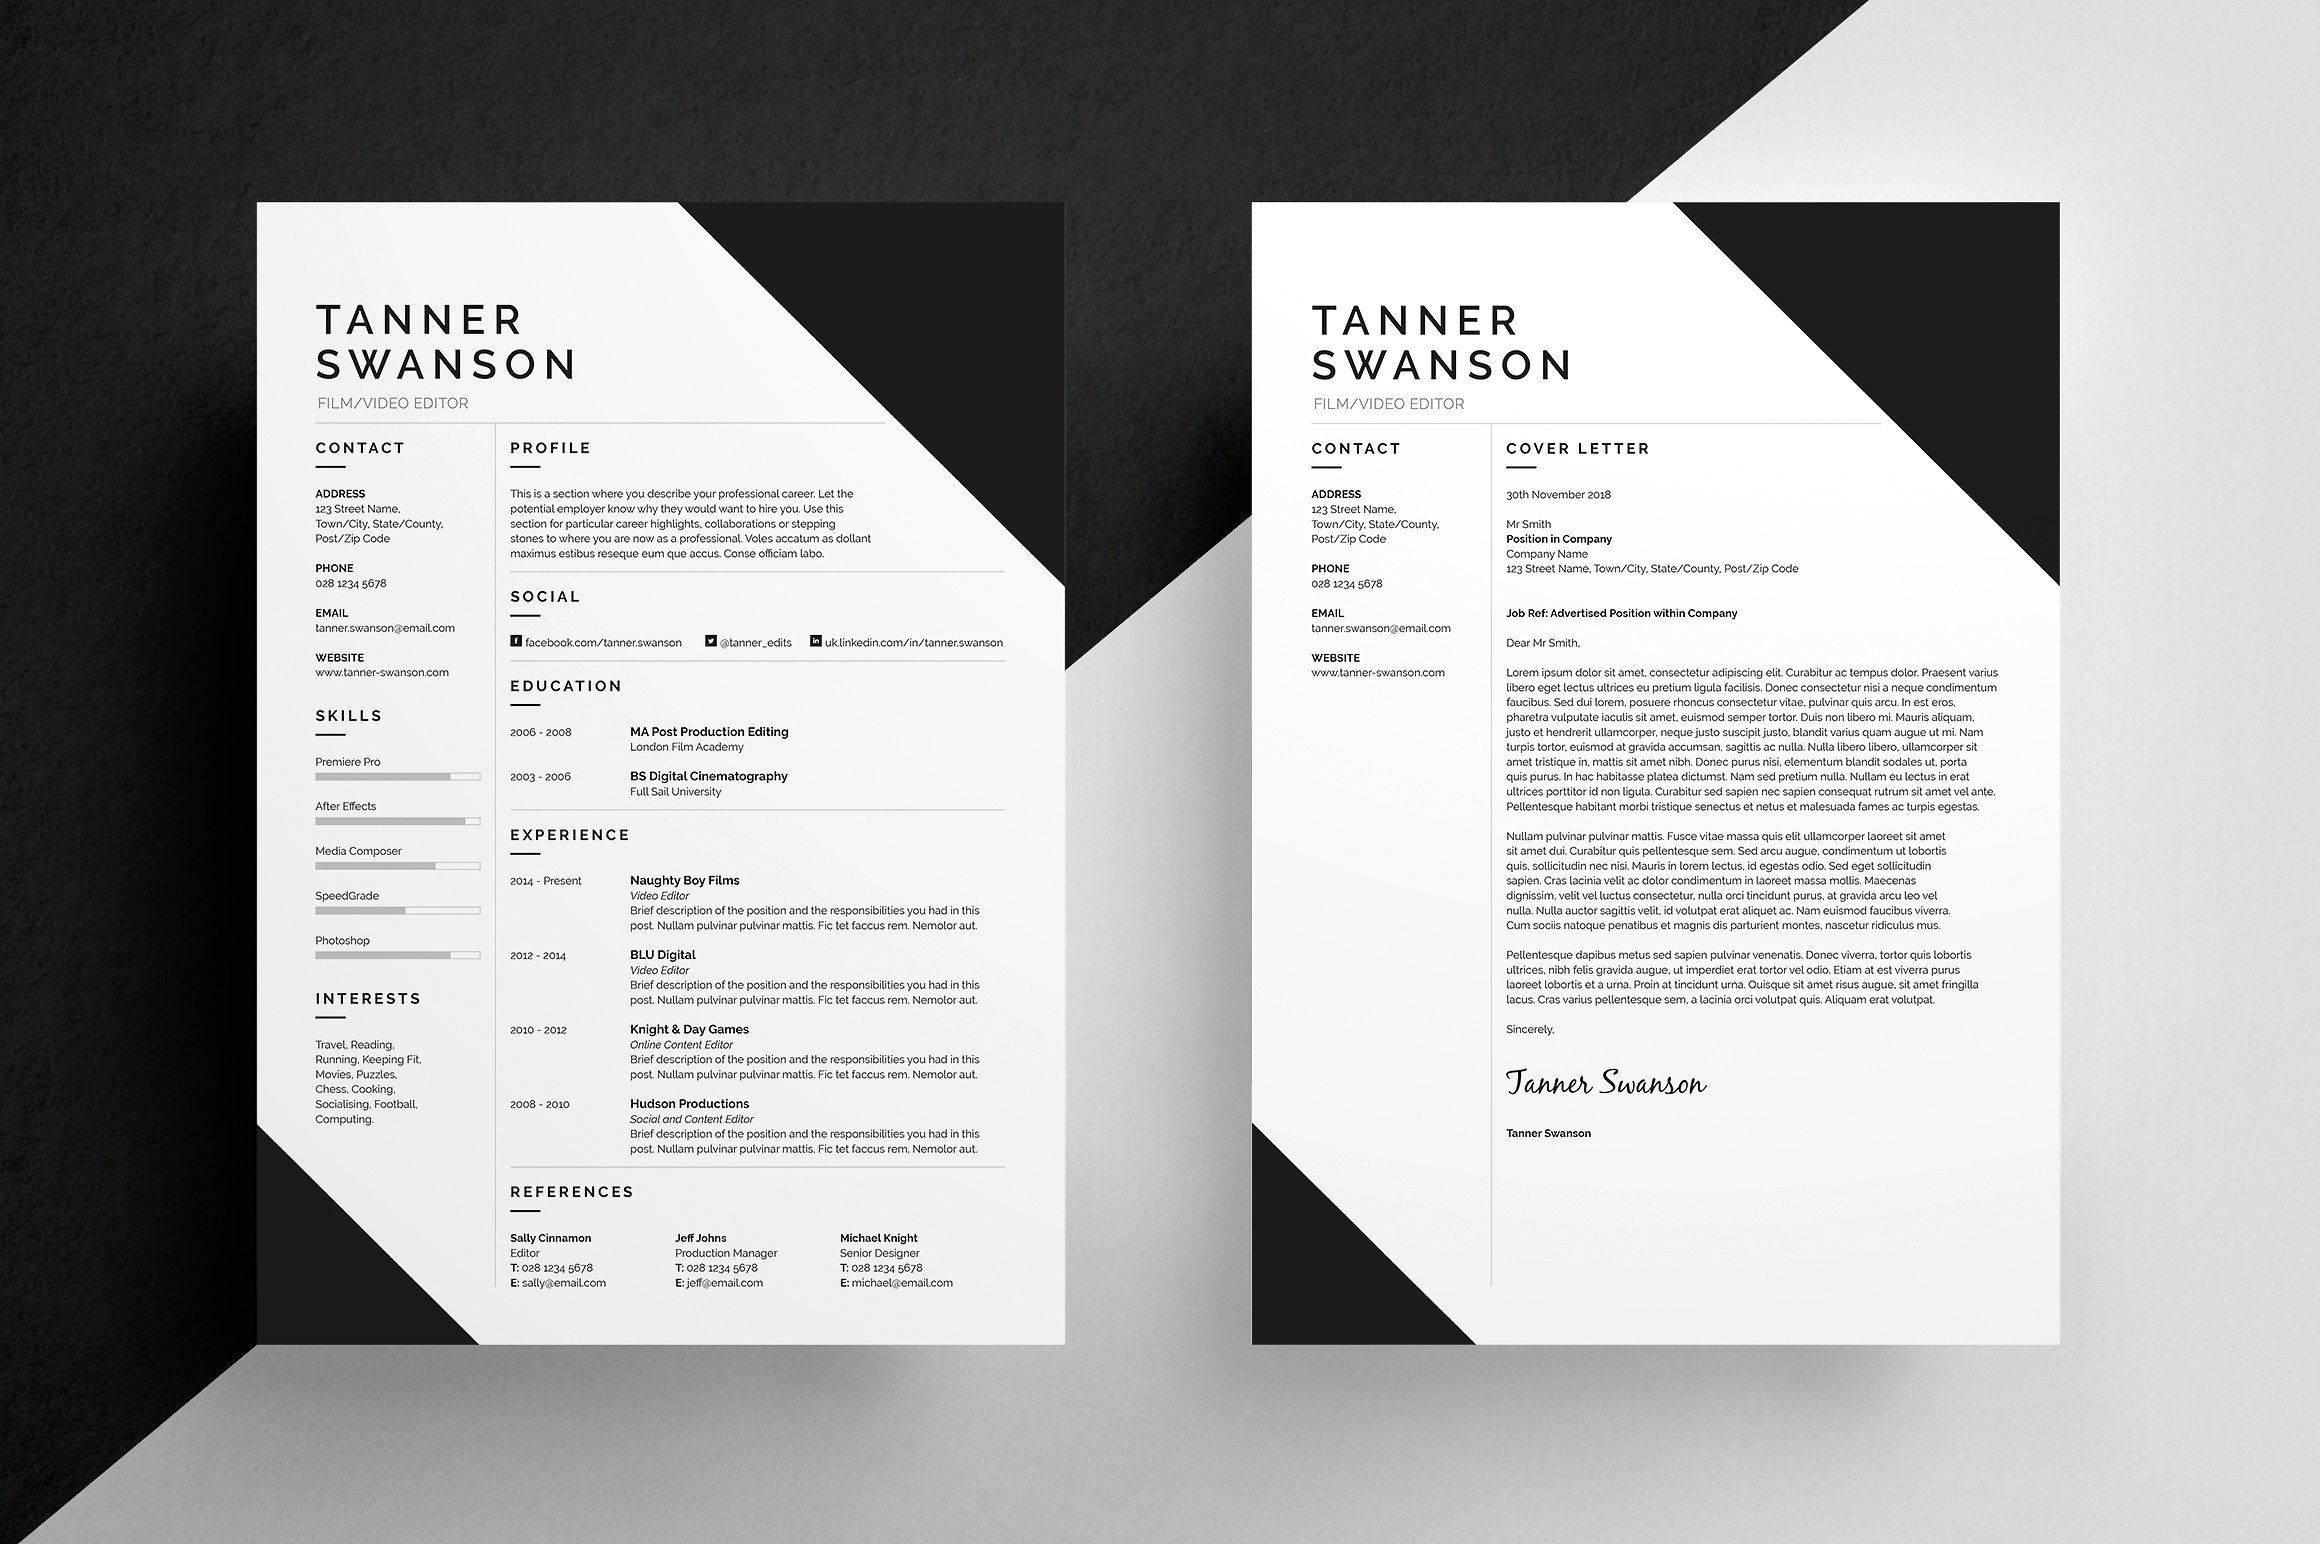 Resume/CV Tanner Resume writing examples, Cv template